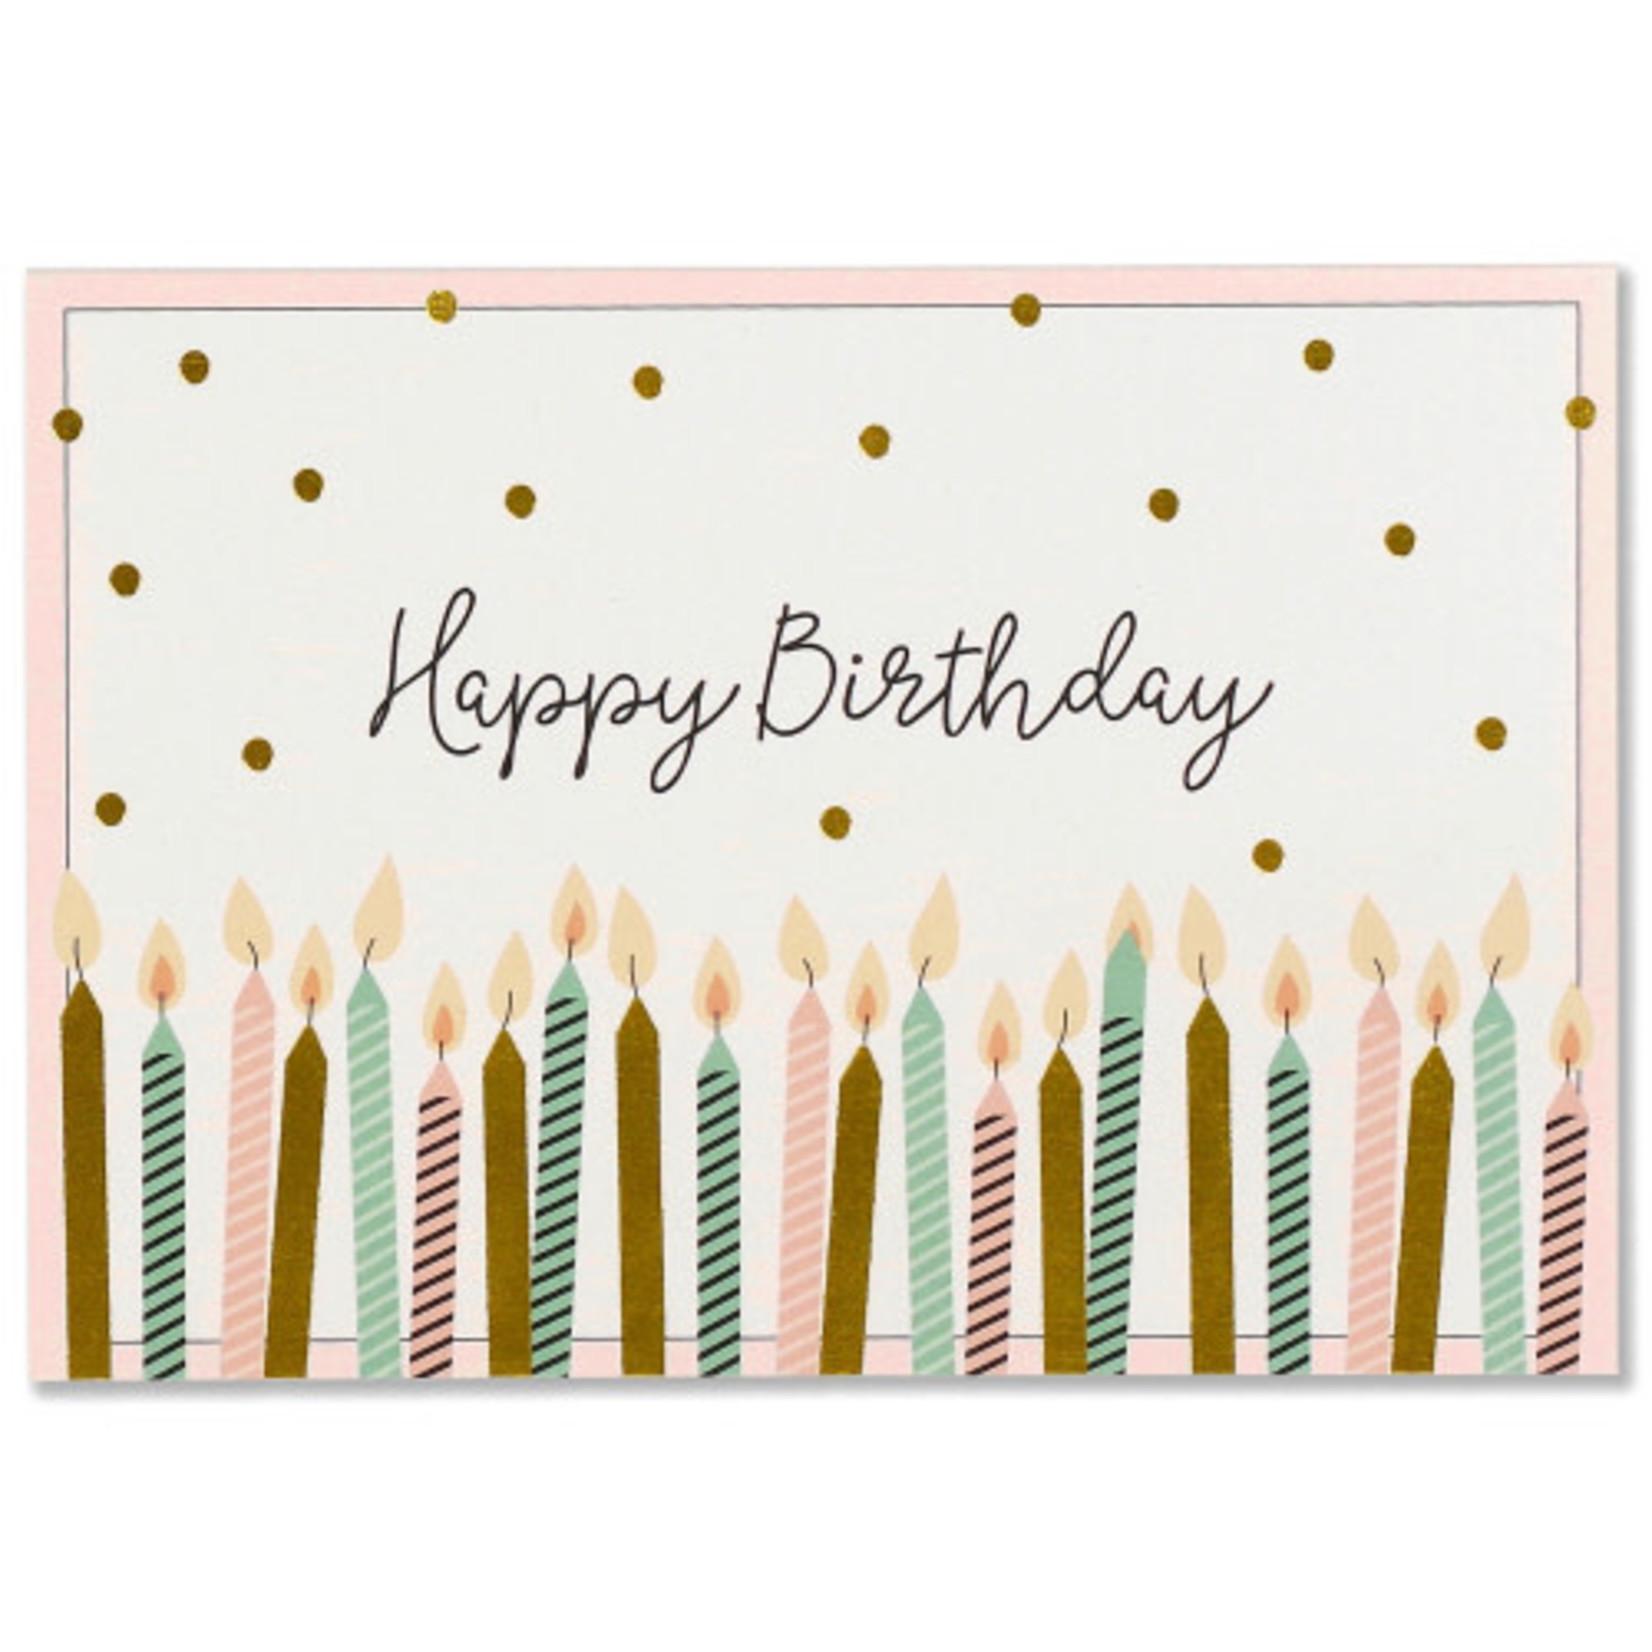 Happy Birthday Note Cards